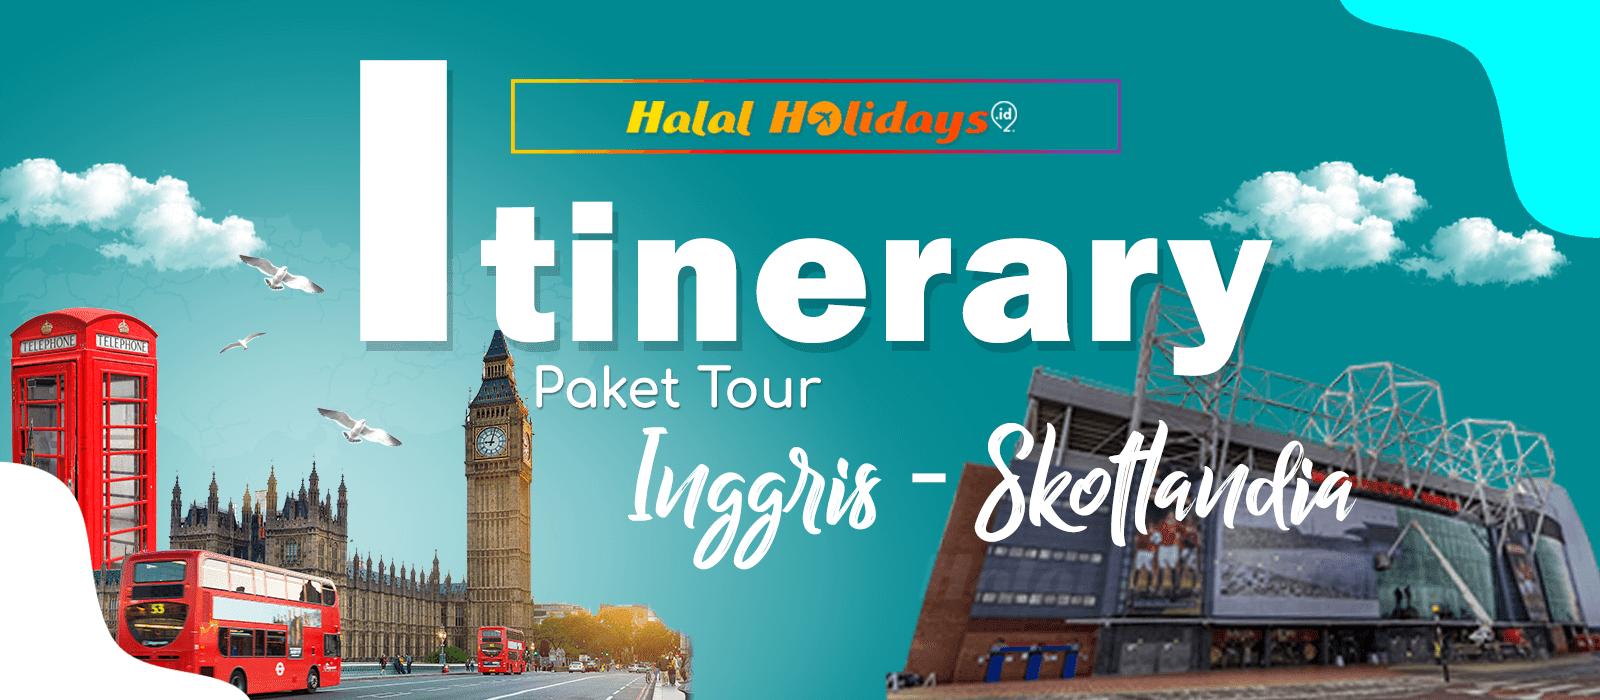 Itinerary Paket Tour Halal Inggris Skotlandia 9 Hari